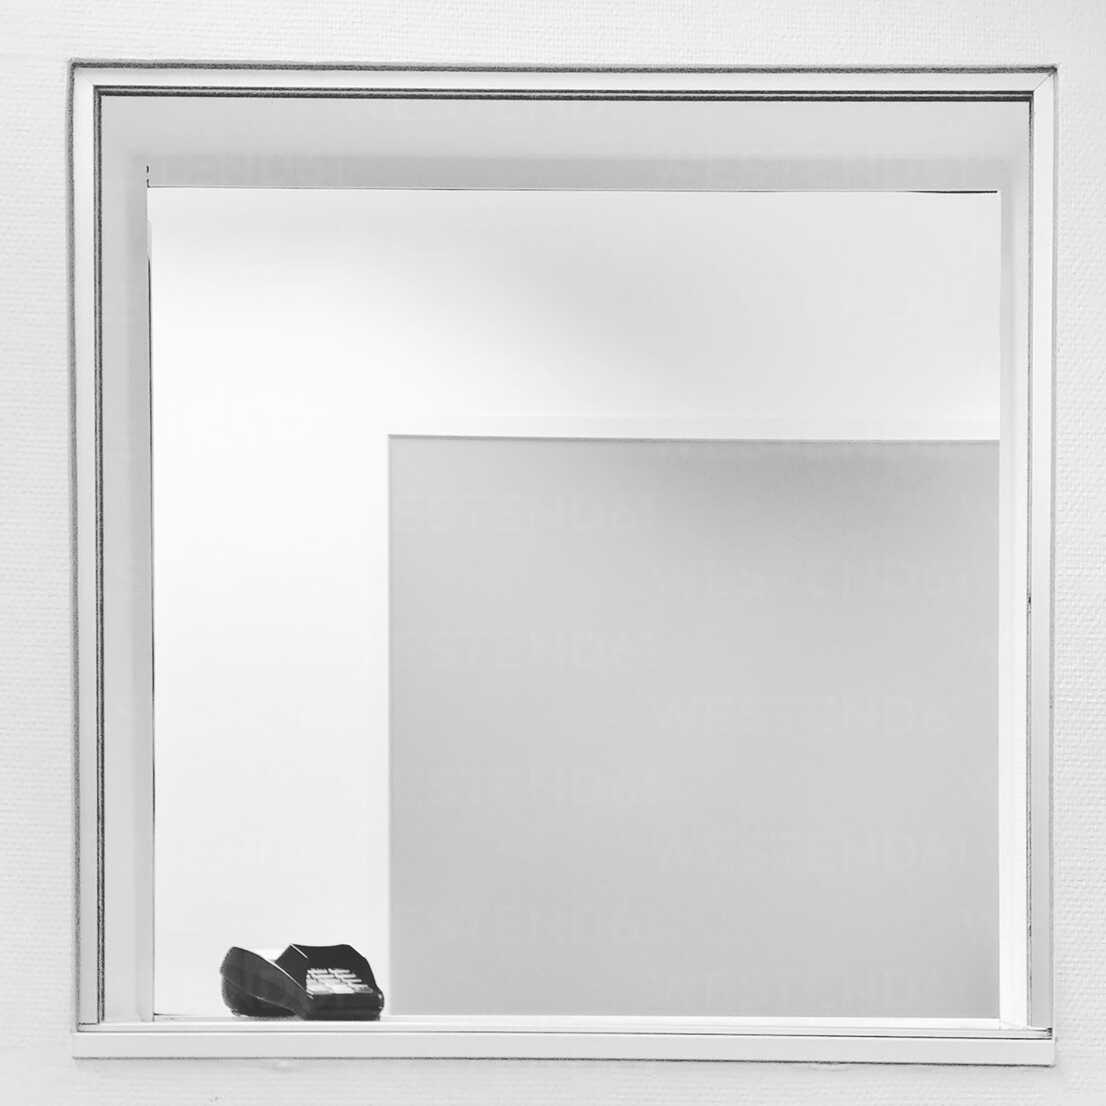 card mashine - NGF00504 - Nadine Ginzel/Westend61